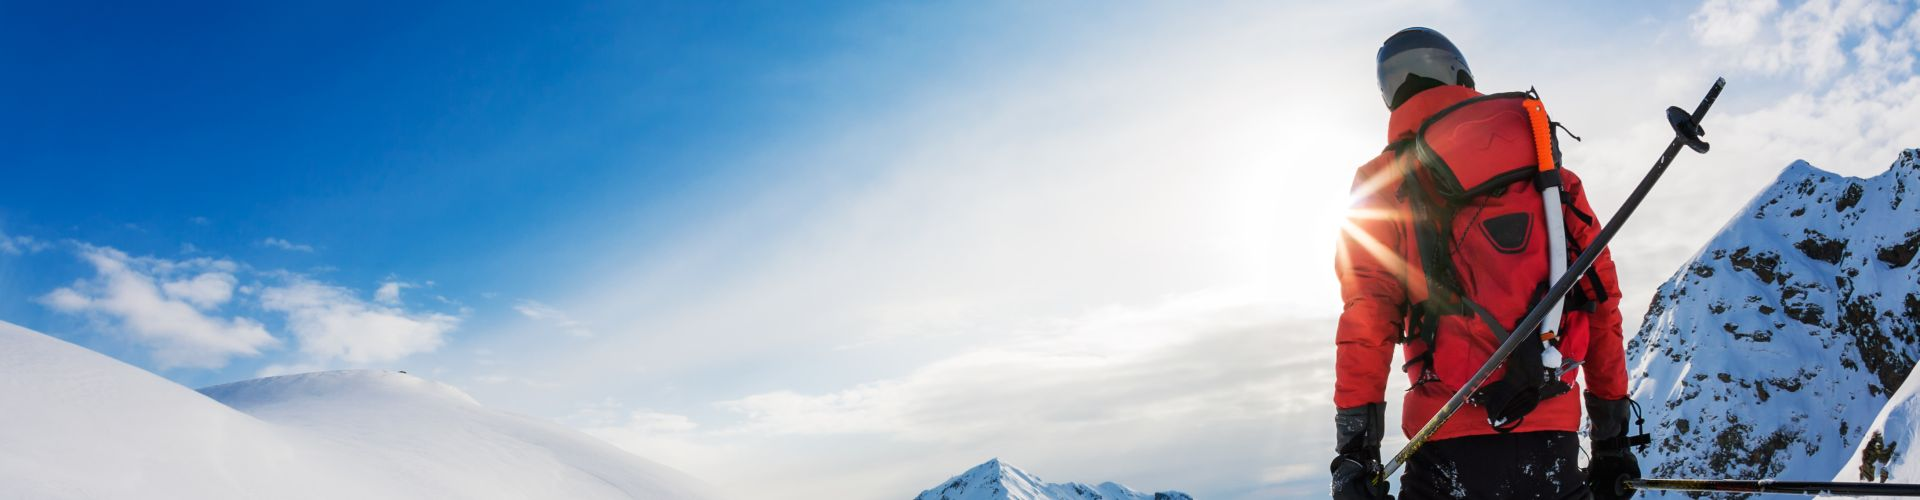 skiurlaub für singles ab 50